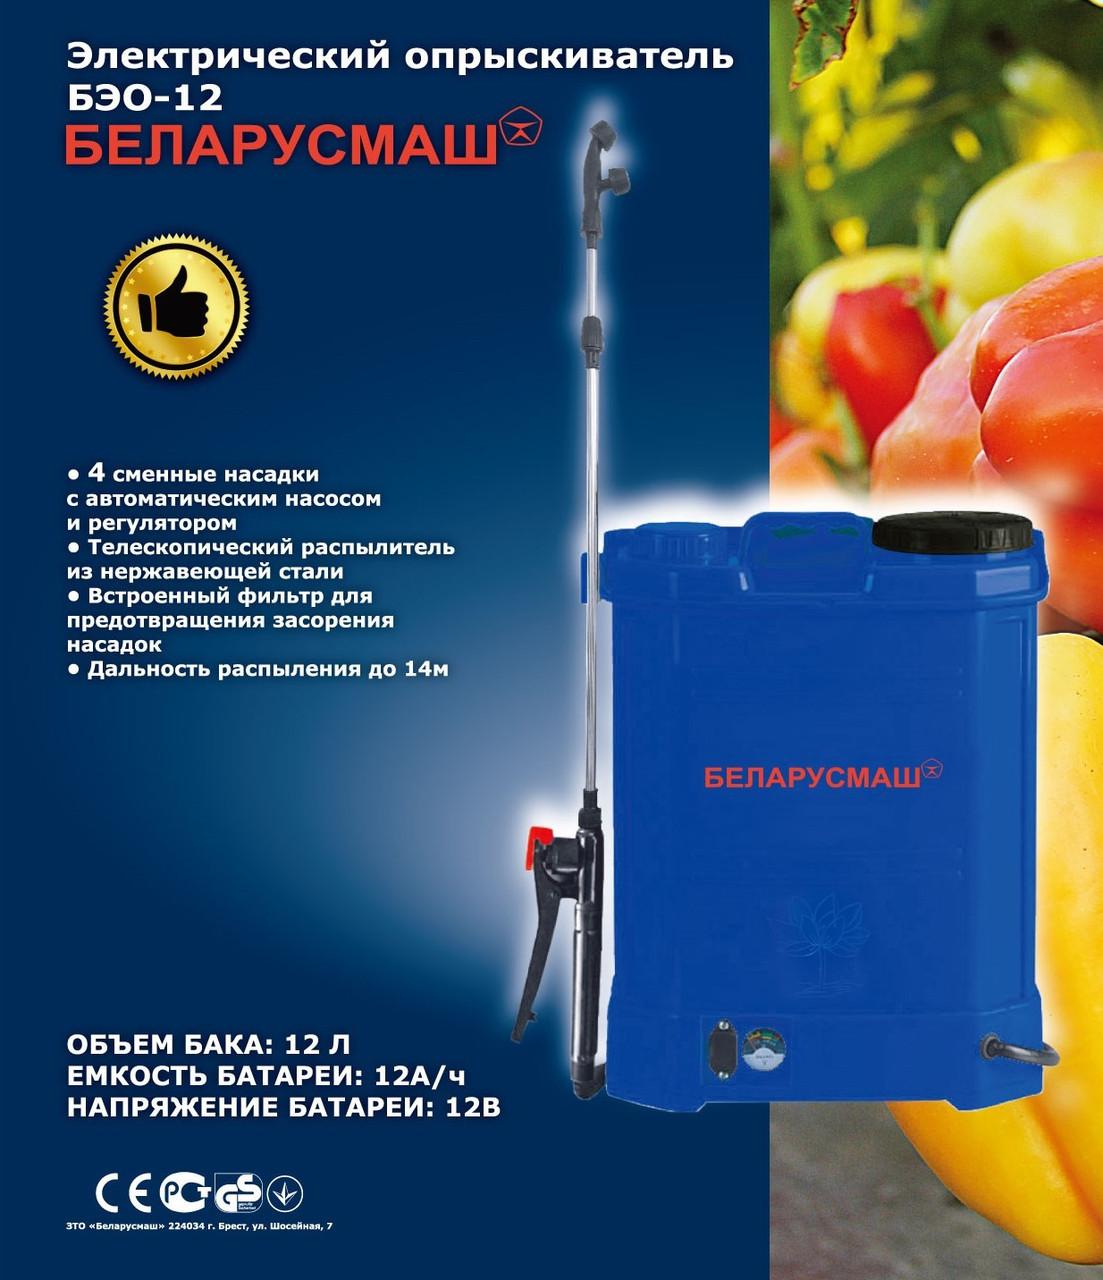 Опрыскиватель Беларусмаш БЭО-12